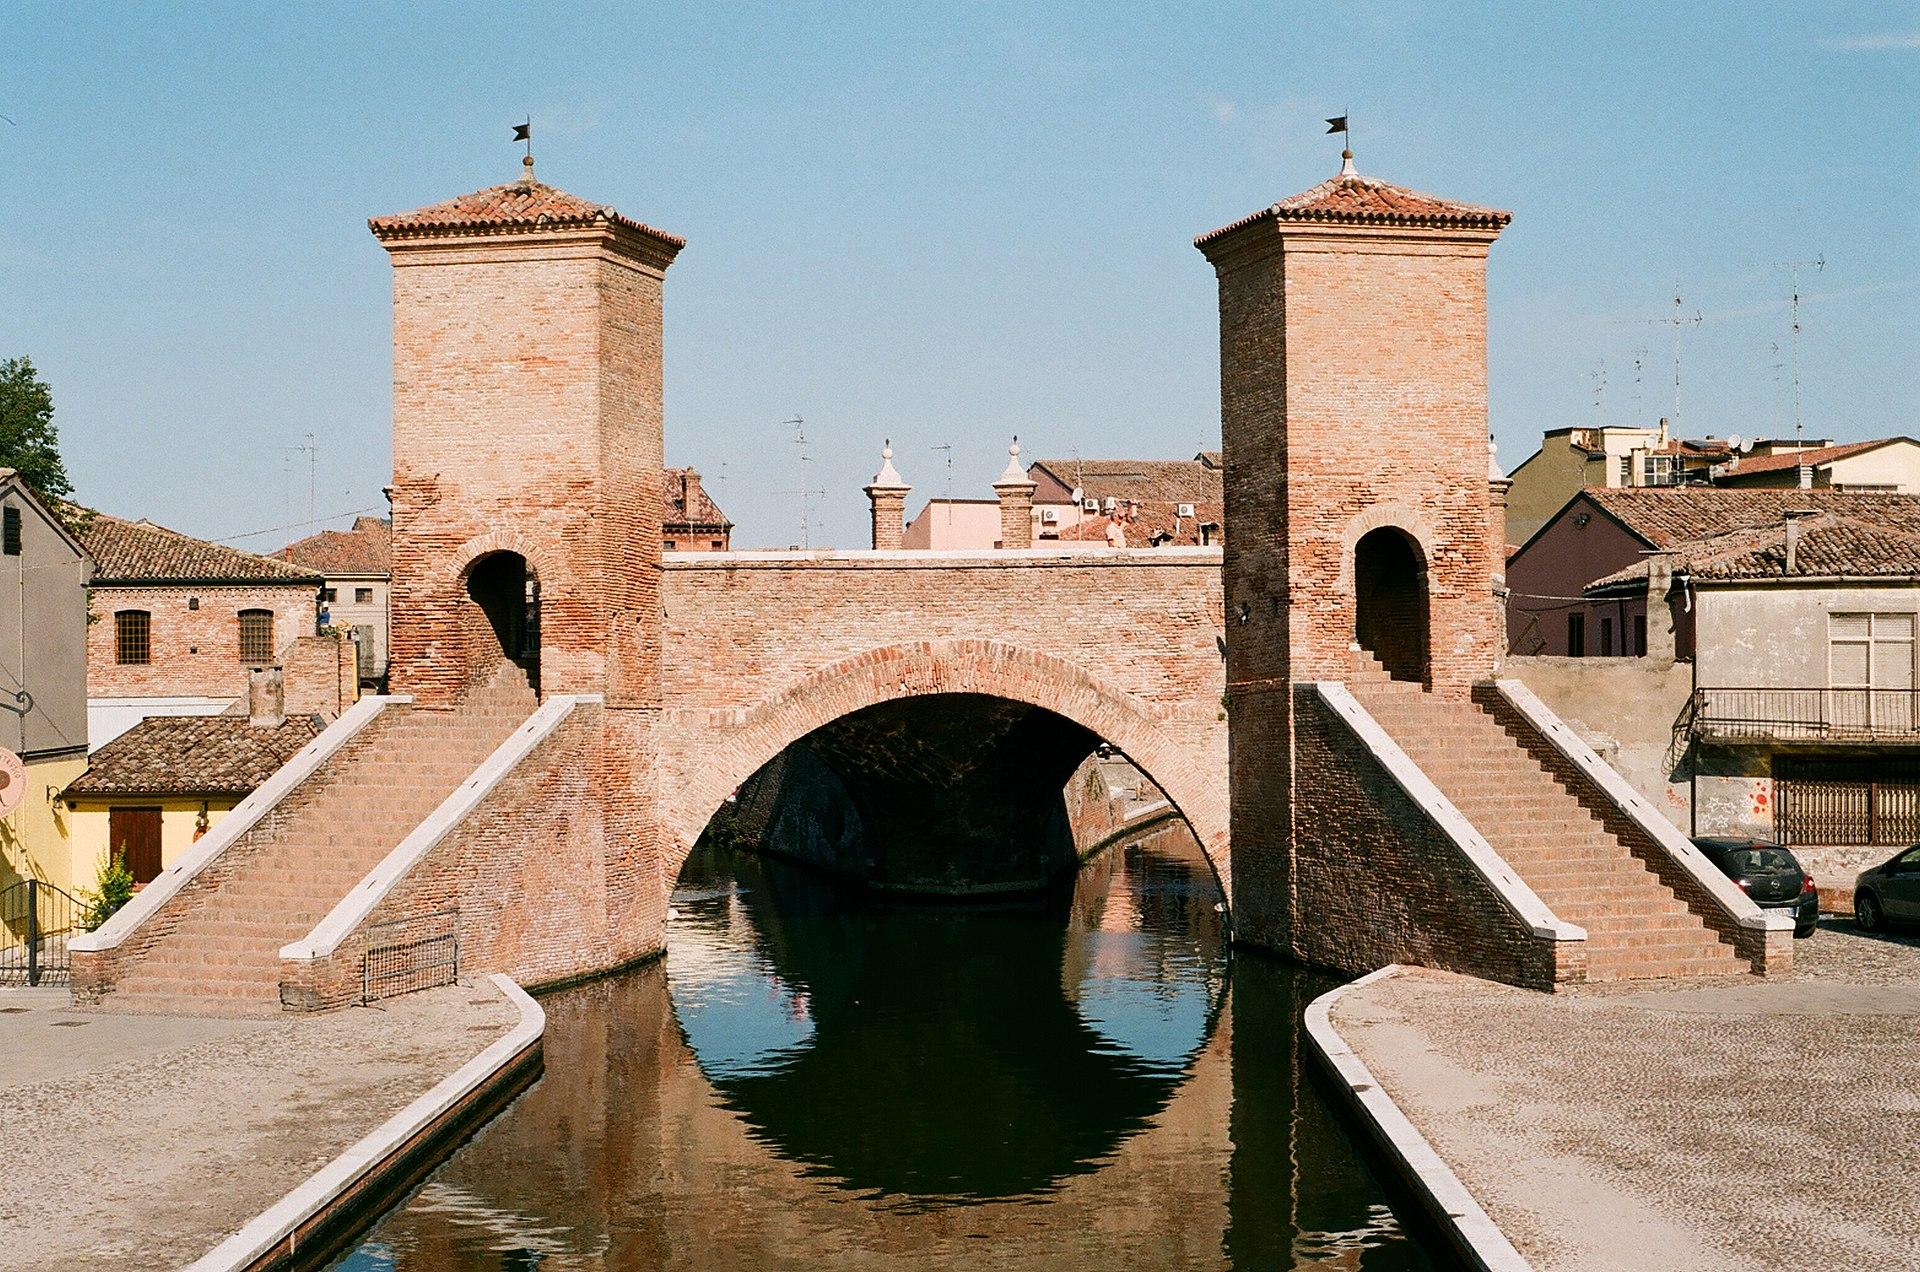 https://upload.wikimedia.org/wikipedia/commons/thumb/6/6e/Gate_to_Comacchio.jpg/1920px-Gate_to_Comacchio.jpg